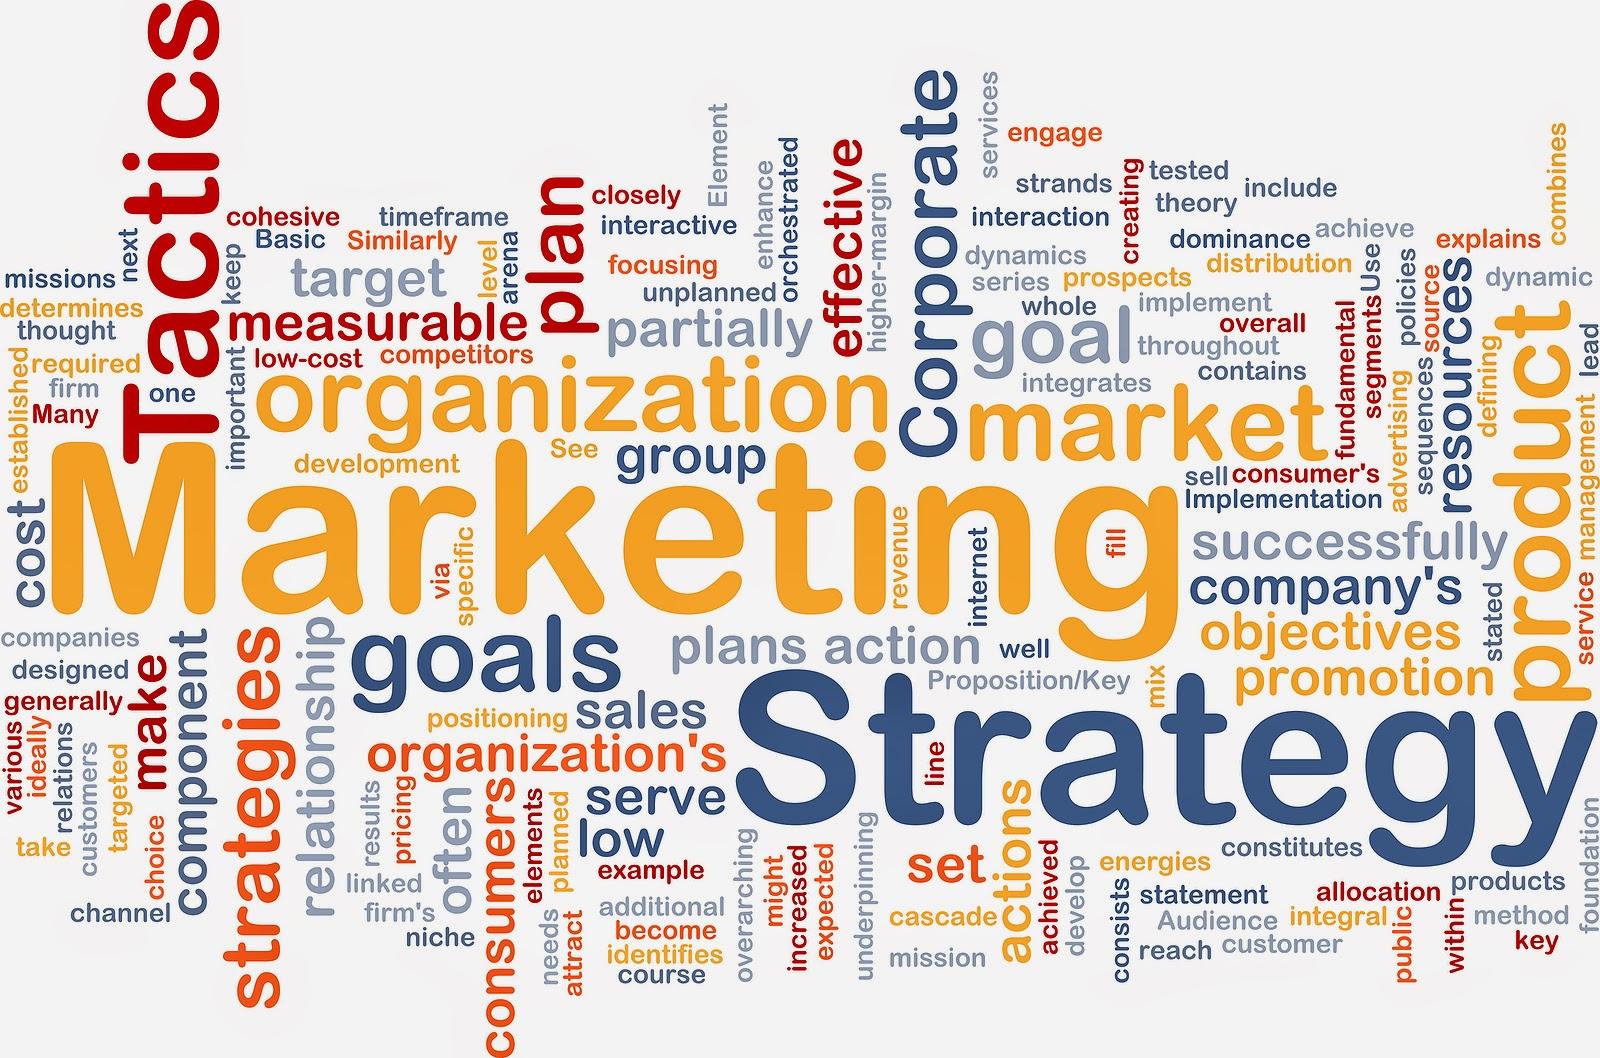 How To Build Your Marketing Awareness?